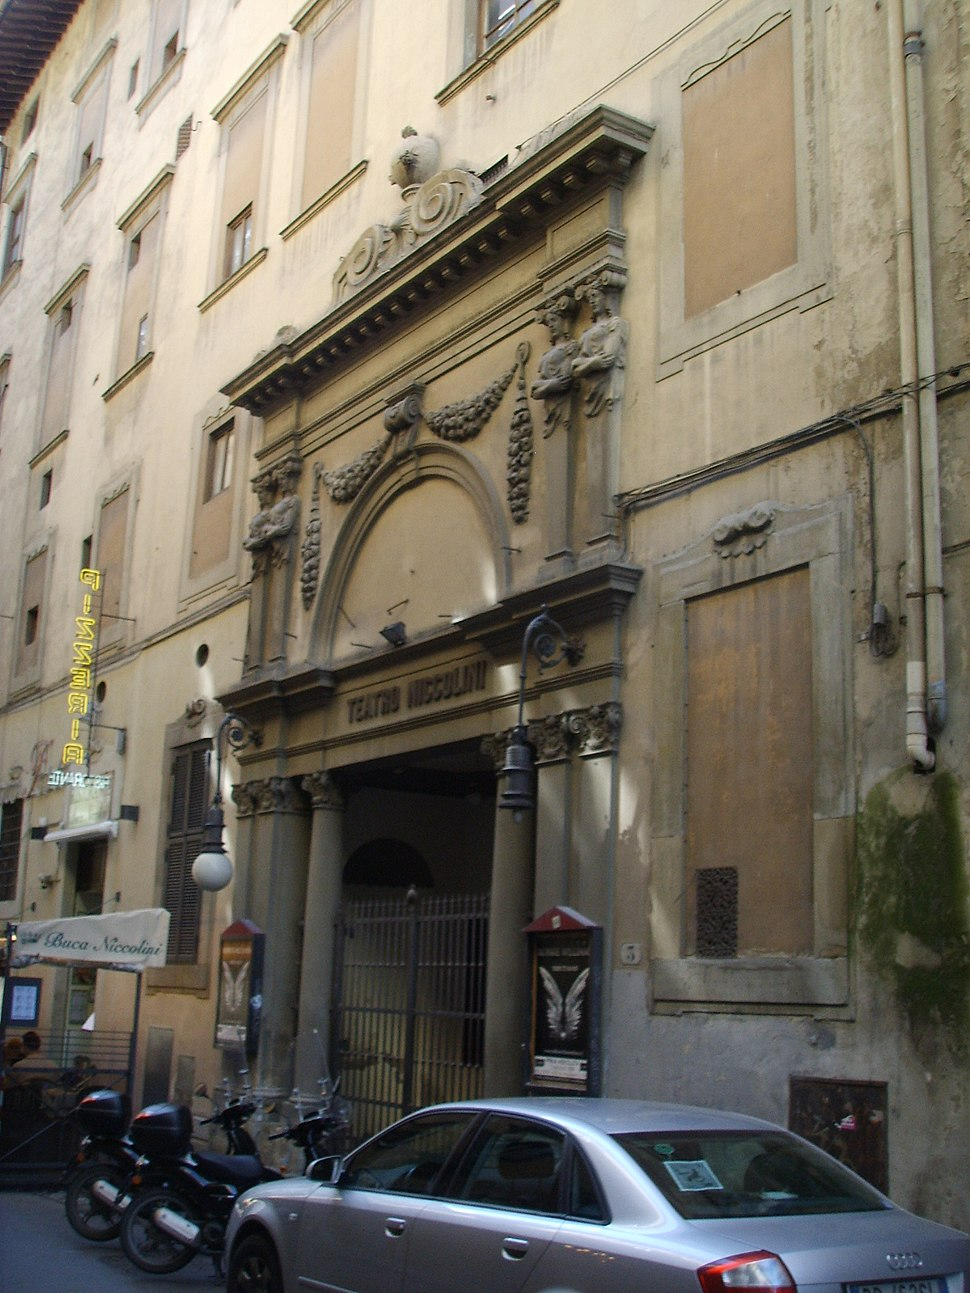 Teatro niccolini 11